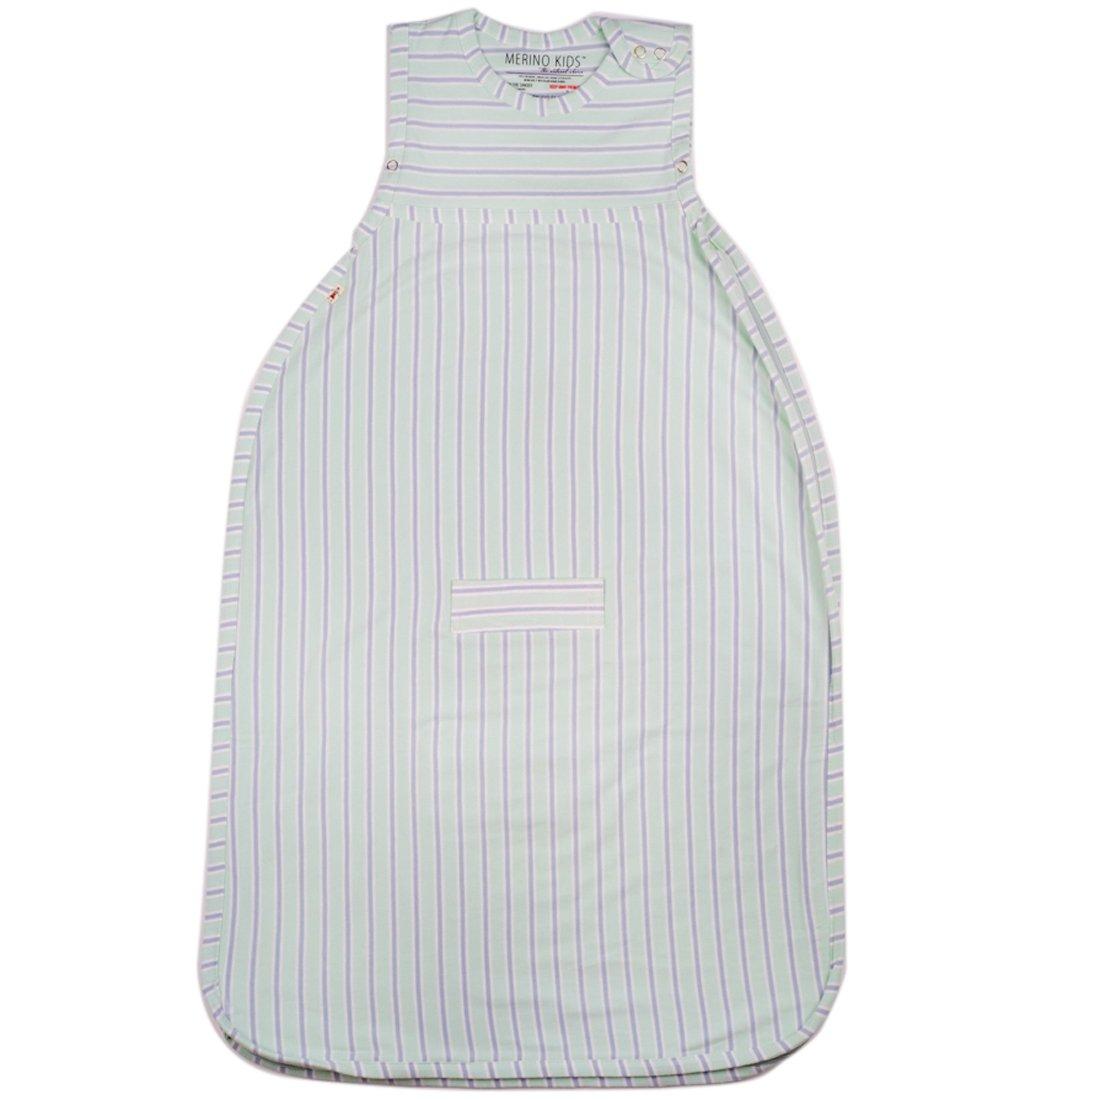 Merino Kids Winter-Weight Baby Sleep Bag For Toddlers 2-4 Years, Light Green/Light Grey Stripe